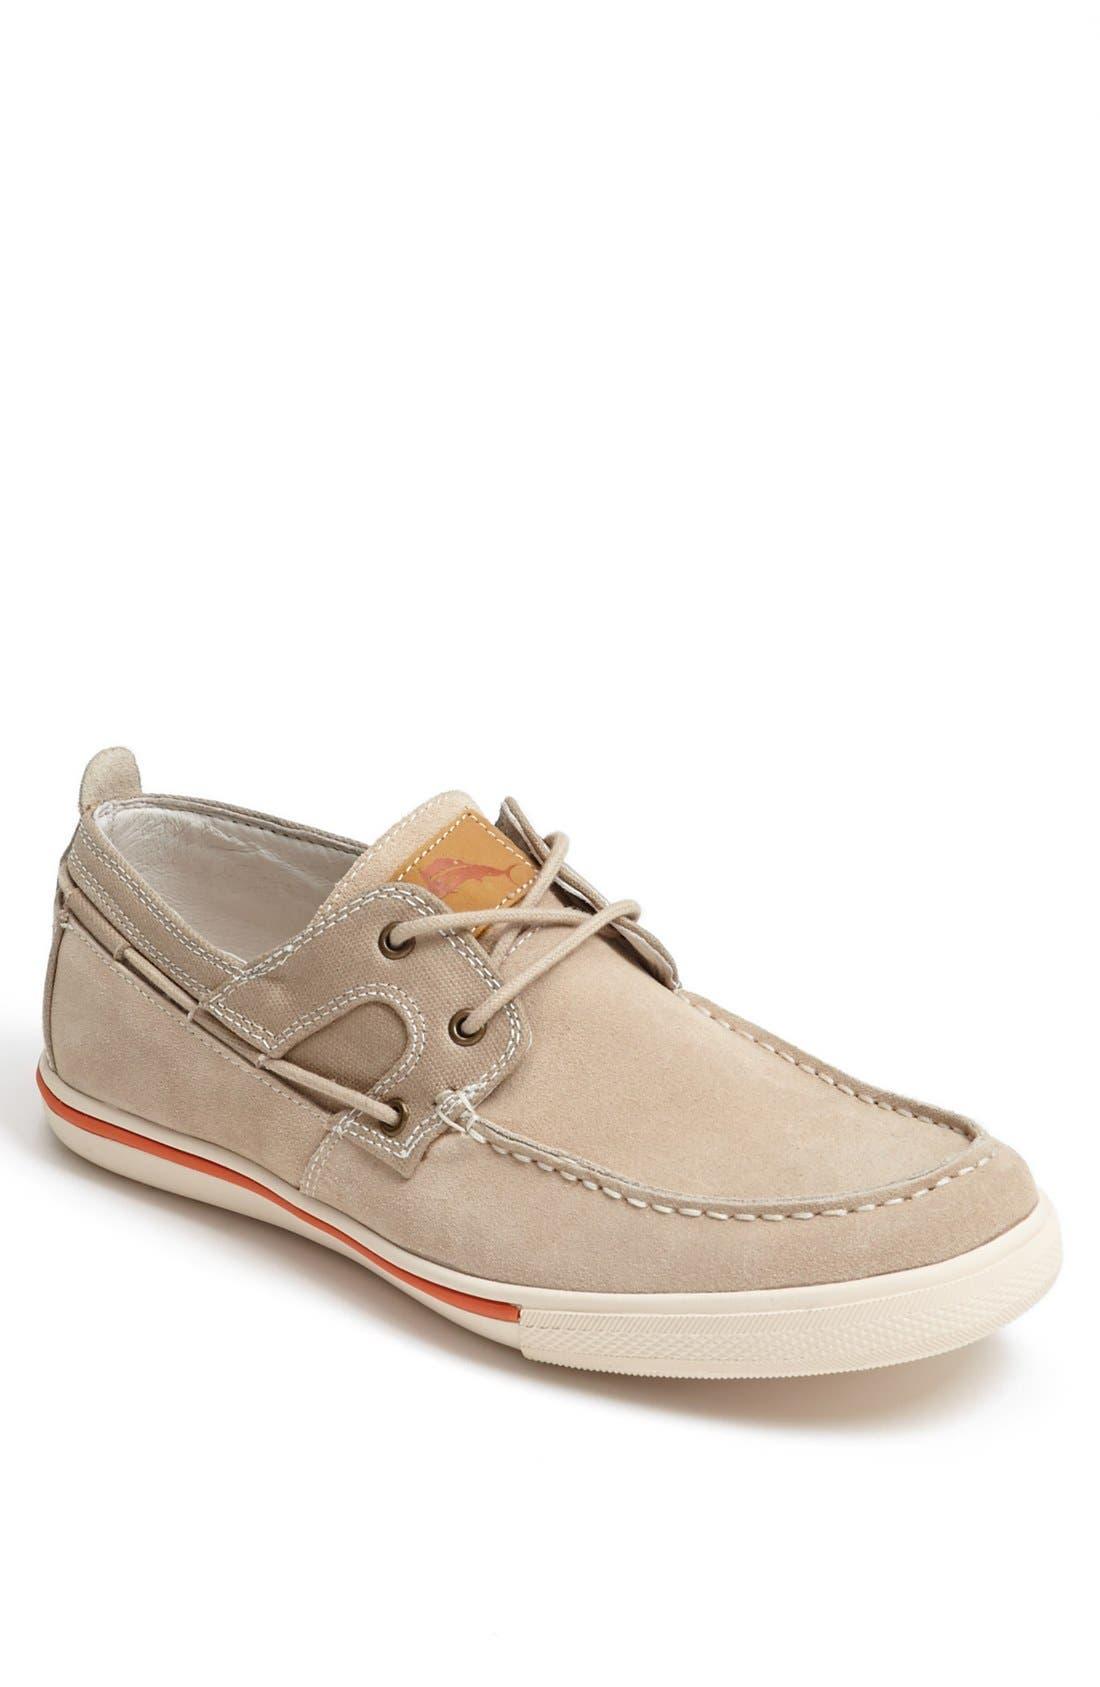 Alternate Image 1 Selected - Tommy Bahama 'Calderon' Boat Shoe